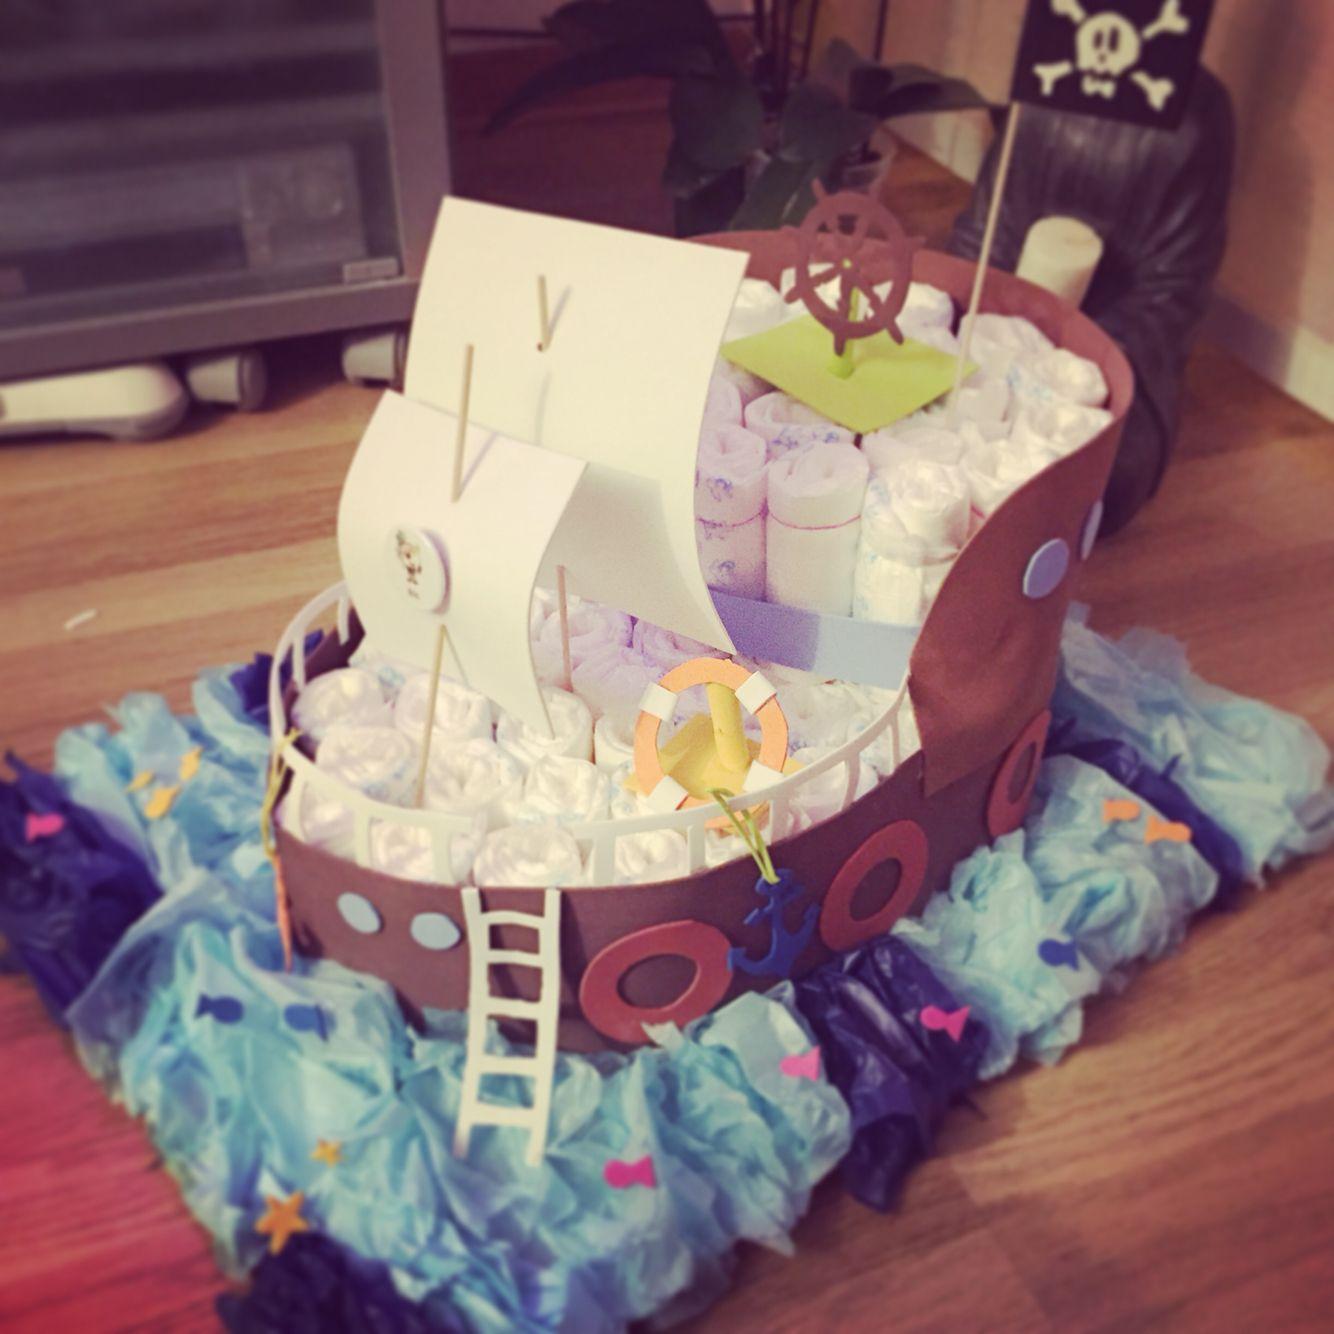 Pirate boat with goma eva, diapers and playmobile. :)  Barco pirata con Goma Eva, pañales y playmobils. :)